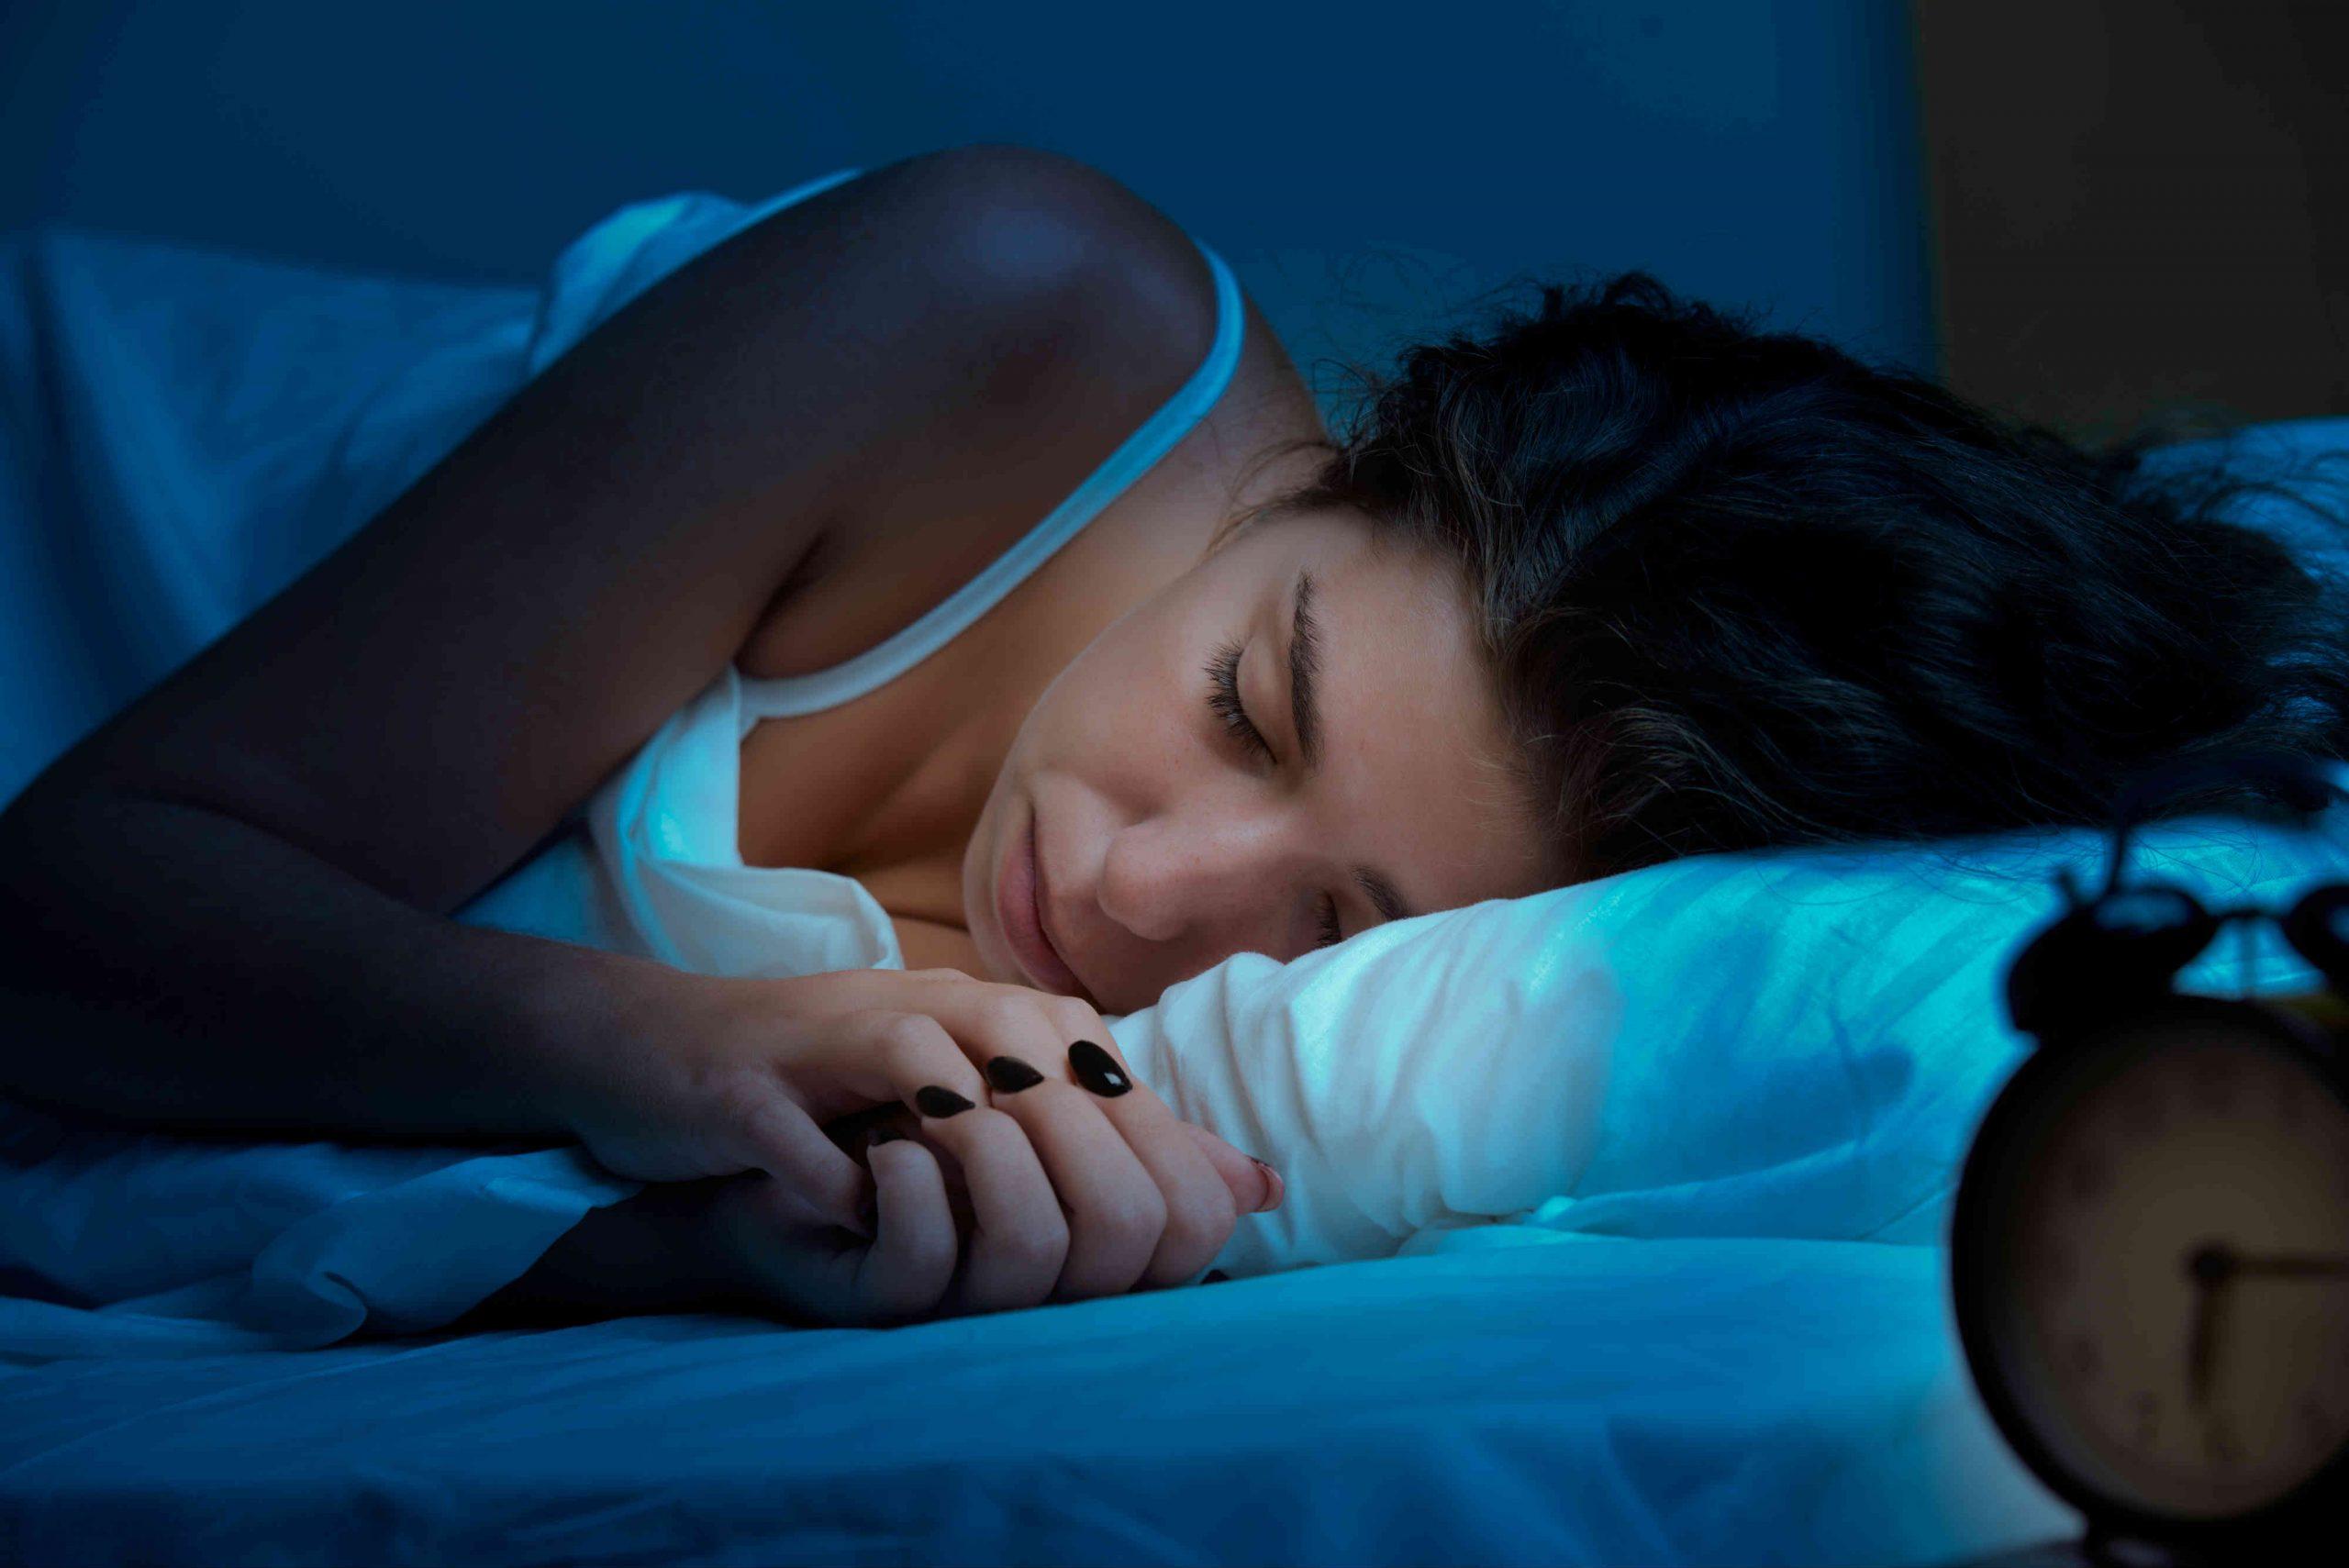 Неврологи объяснили, зачем эволюция сохранила фазу глубокого сна